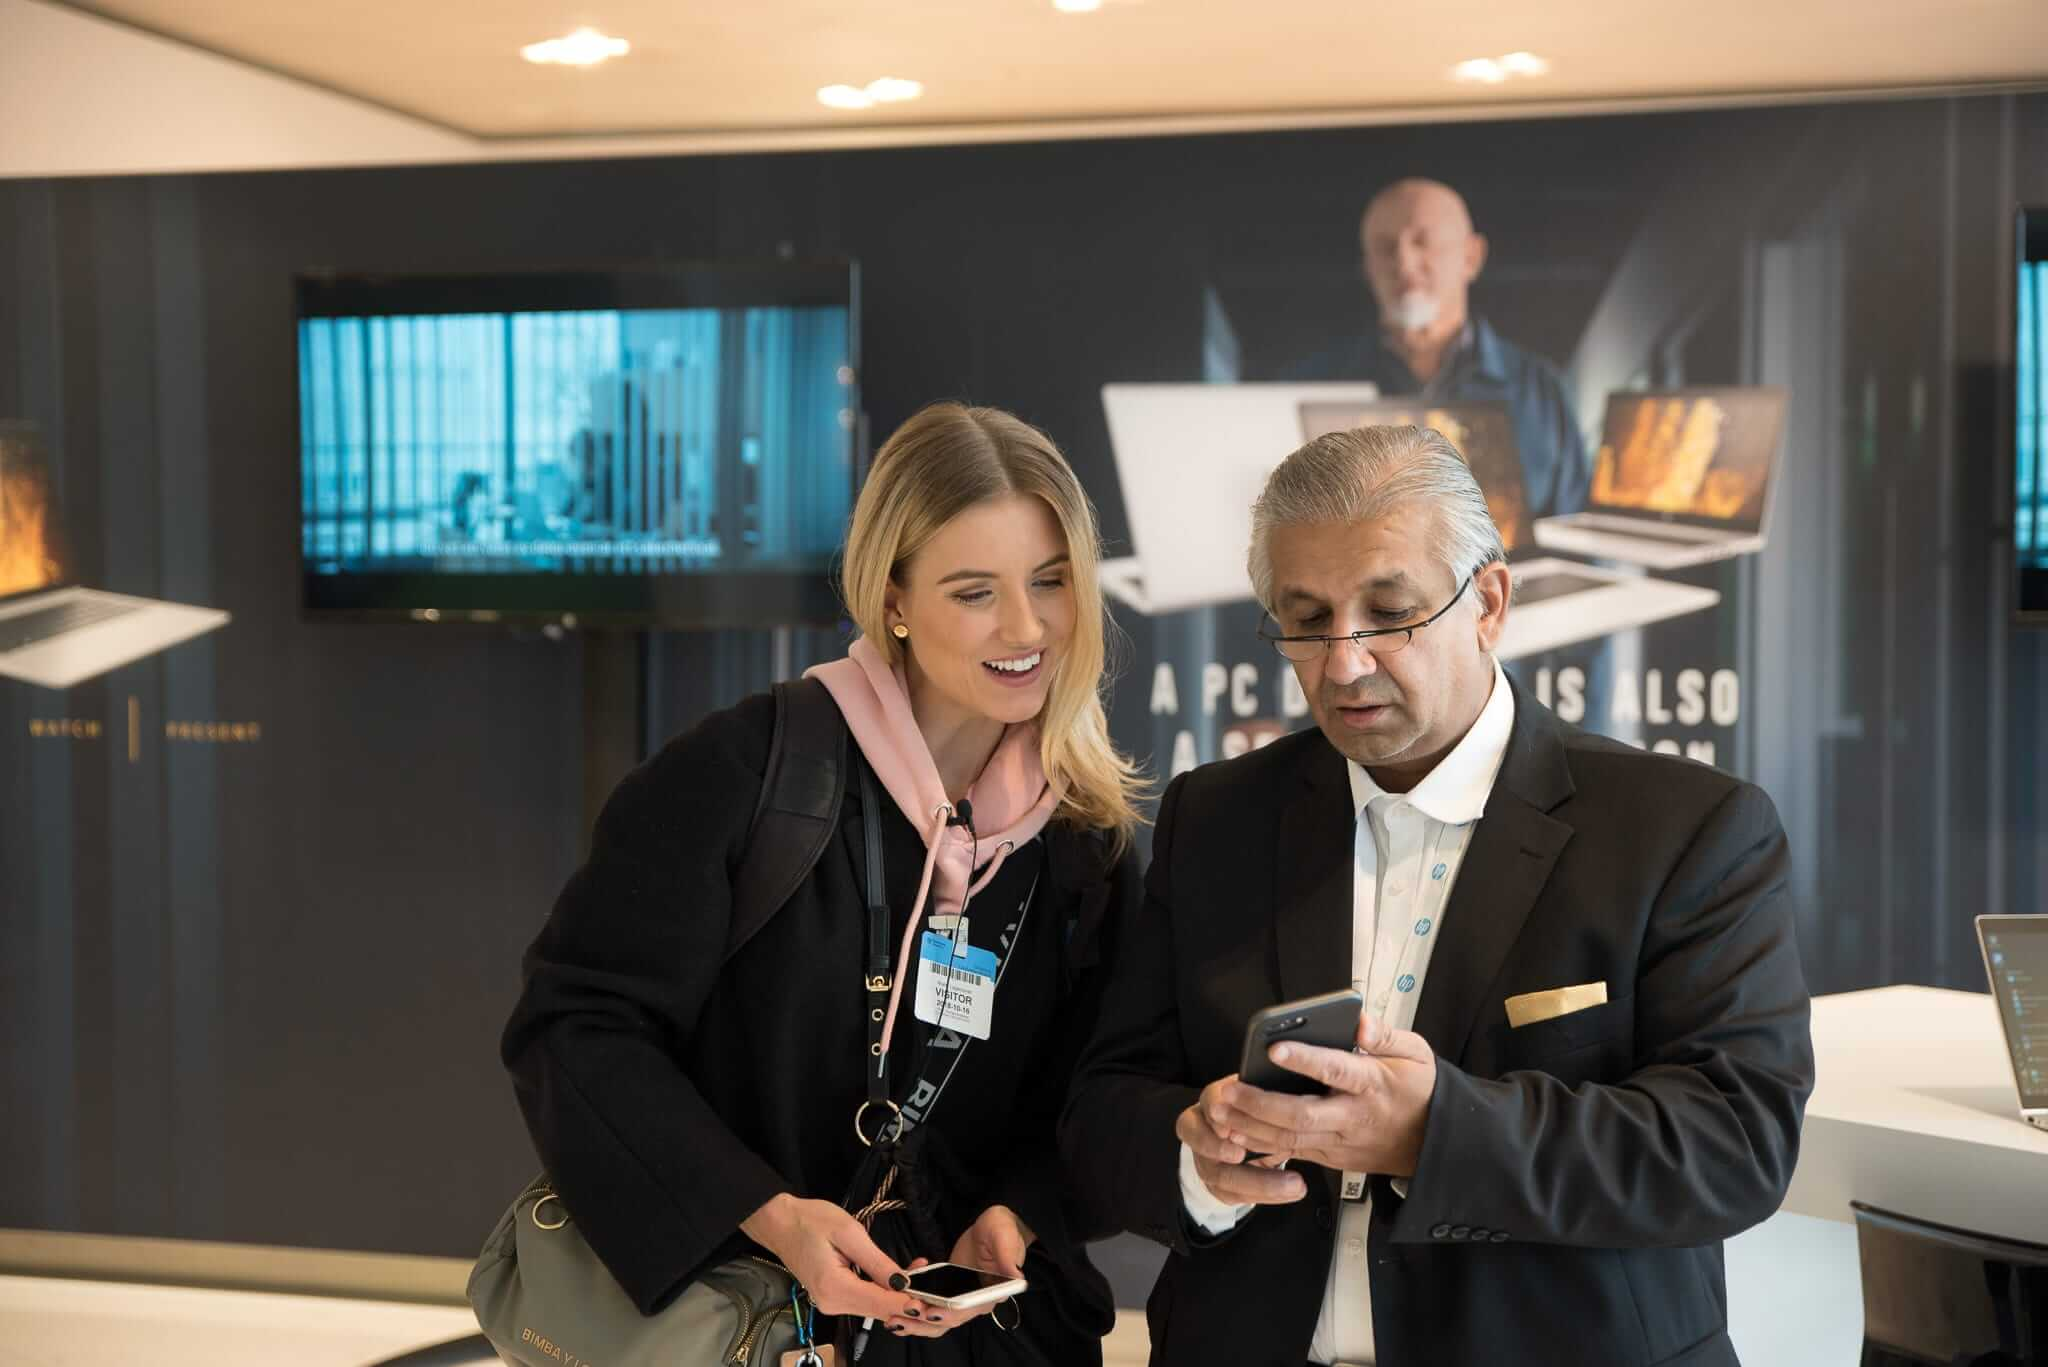 Företags Varumärke Abbe HP Landvetter Airport Photography Annika Lagerqvist www.annikasomething.com